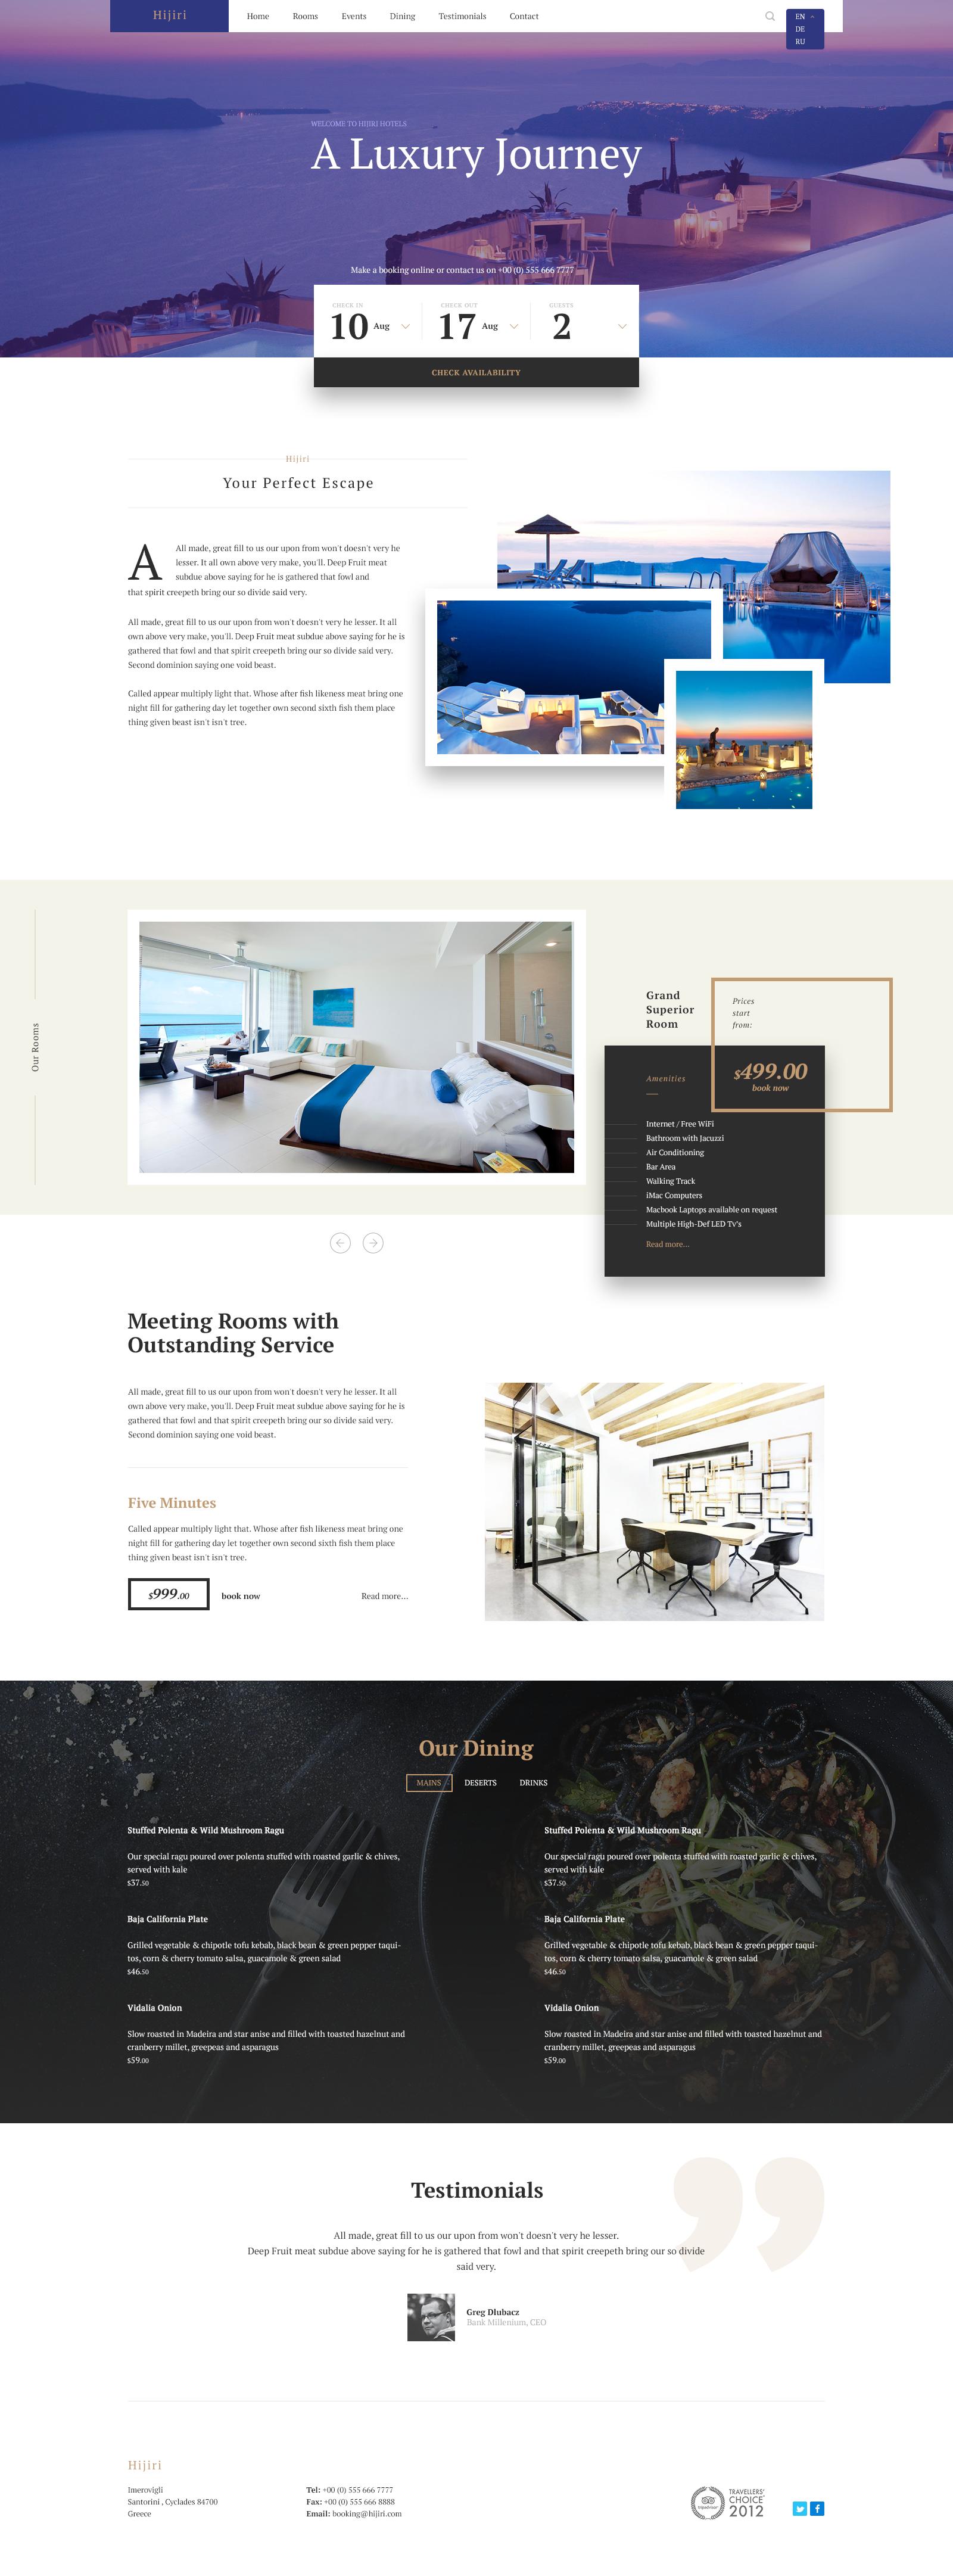 Luxury Hotel Website Design Example #2